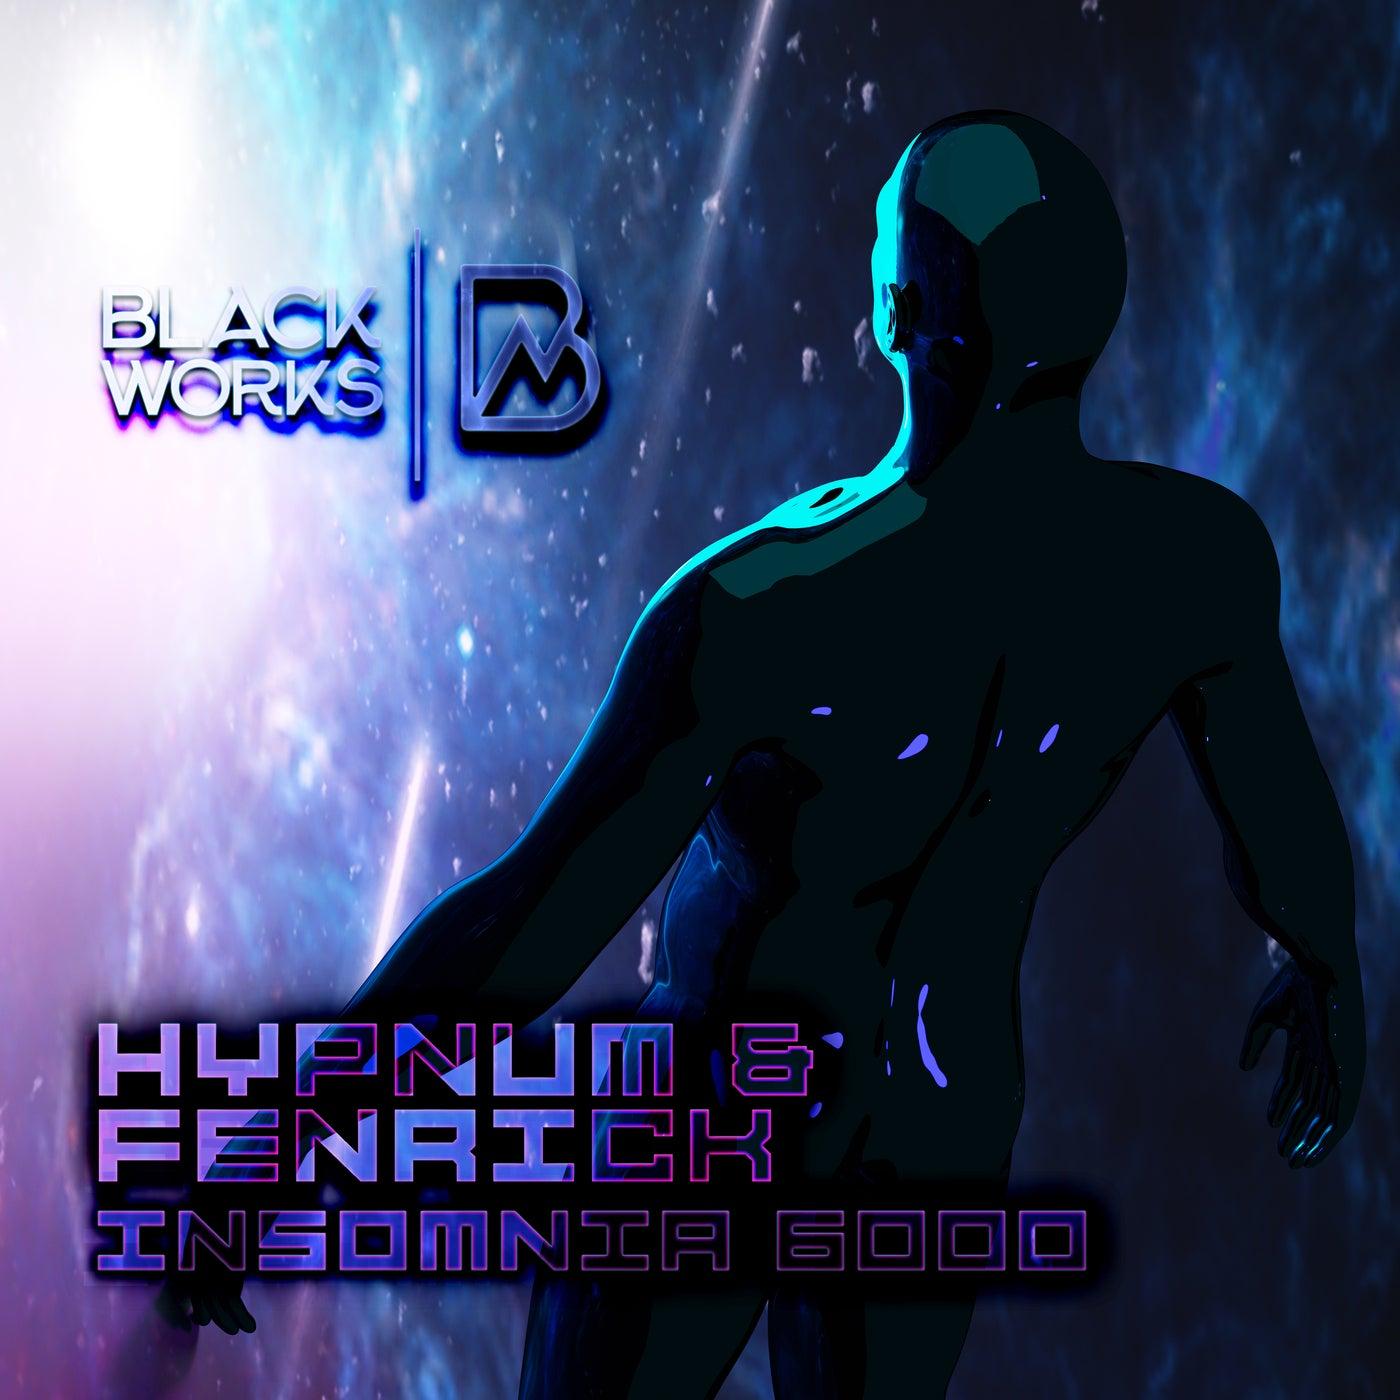 Insomnia 6000 (Emotional Mix)